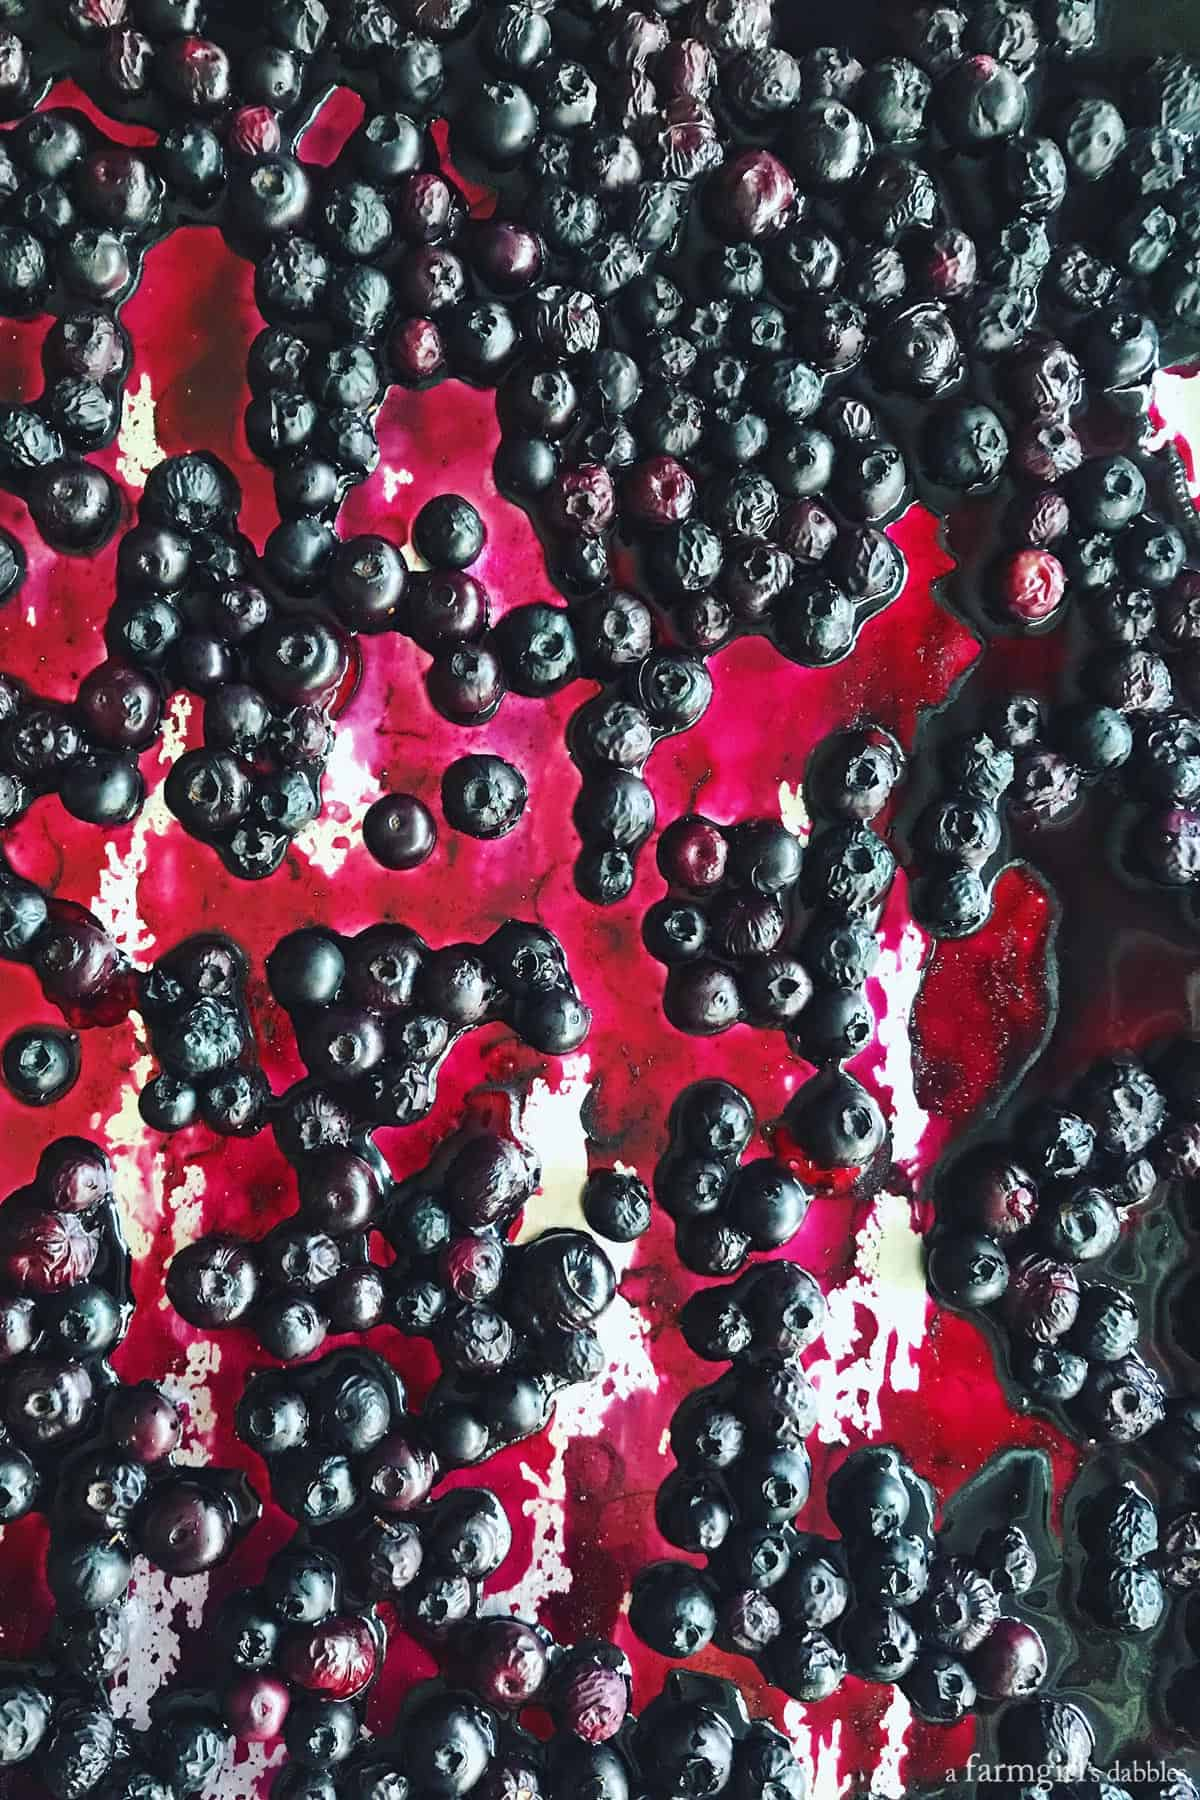 Roasted Blueberry Crème Fraîche Ice Cream from afarmgirlsdabbles.com